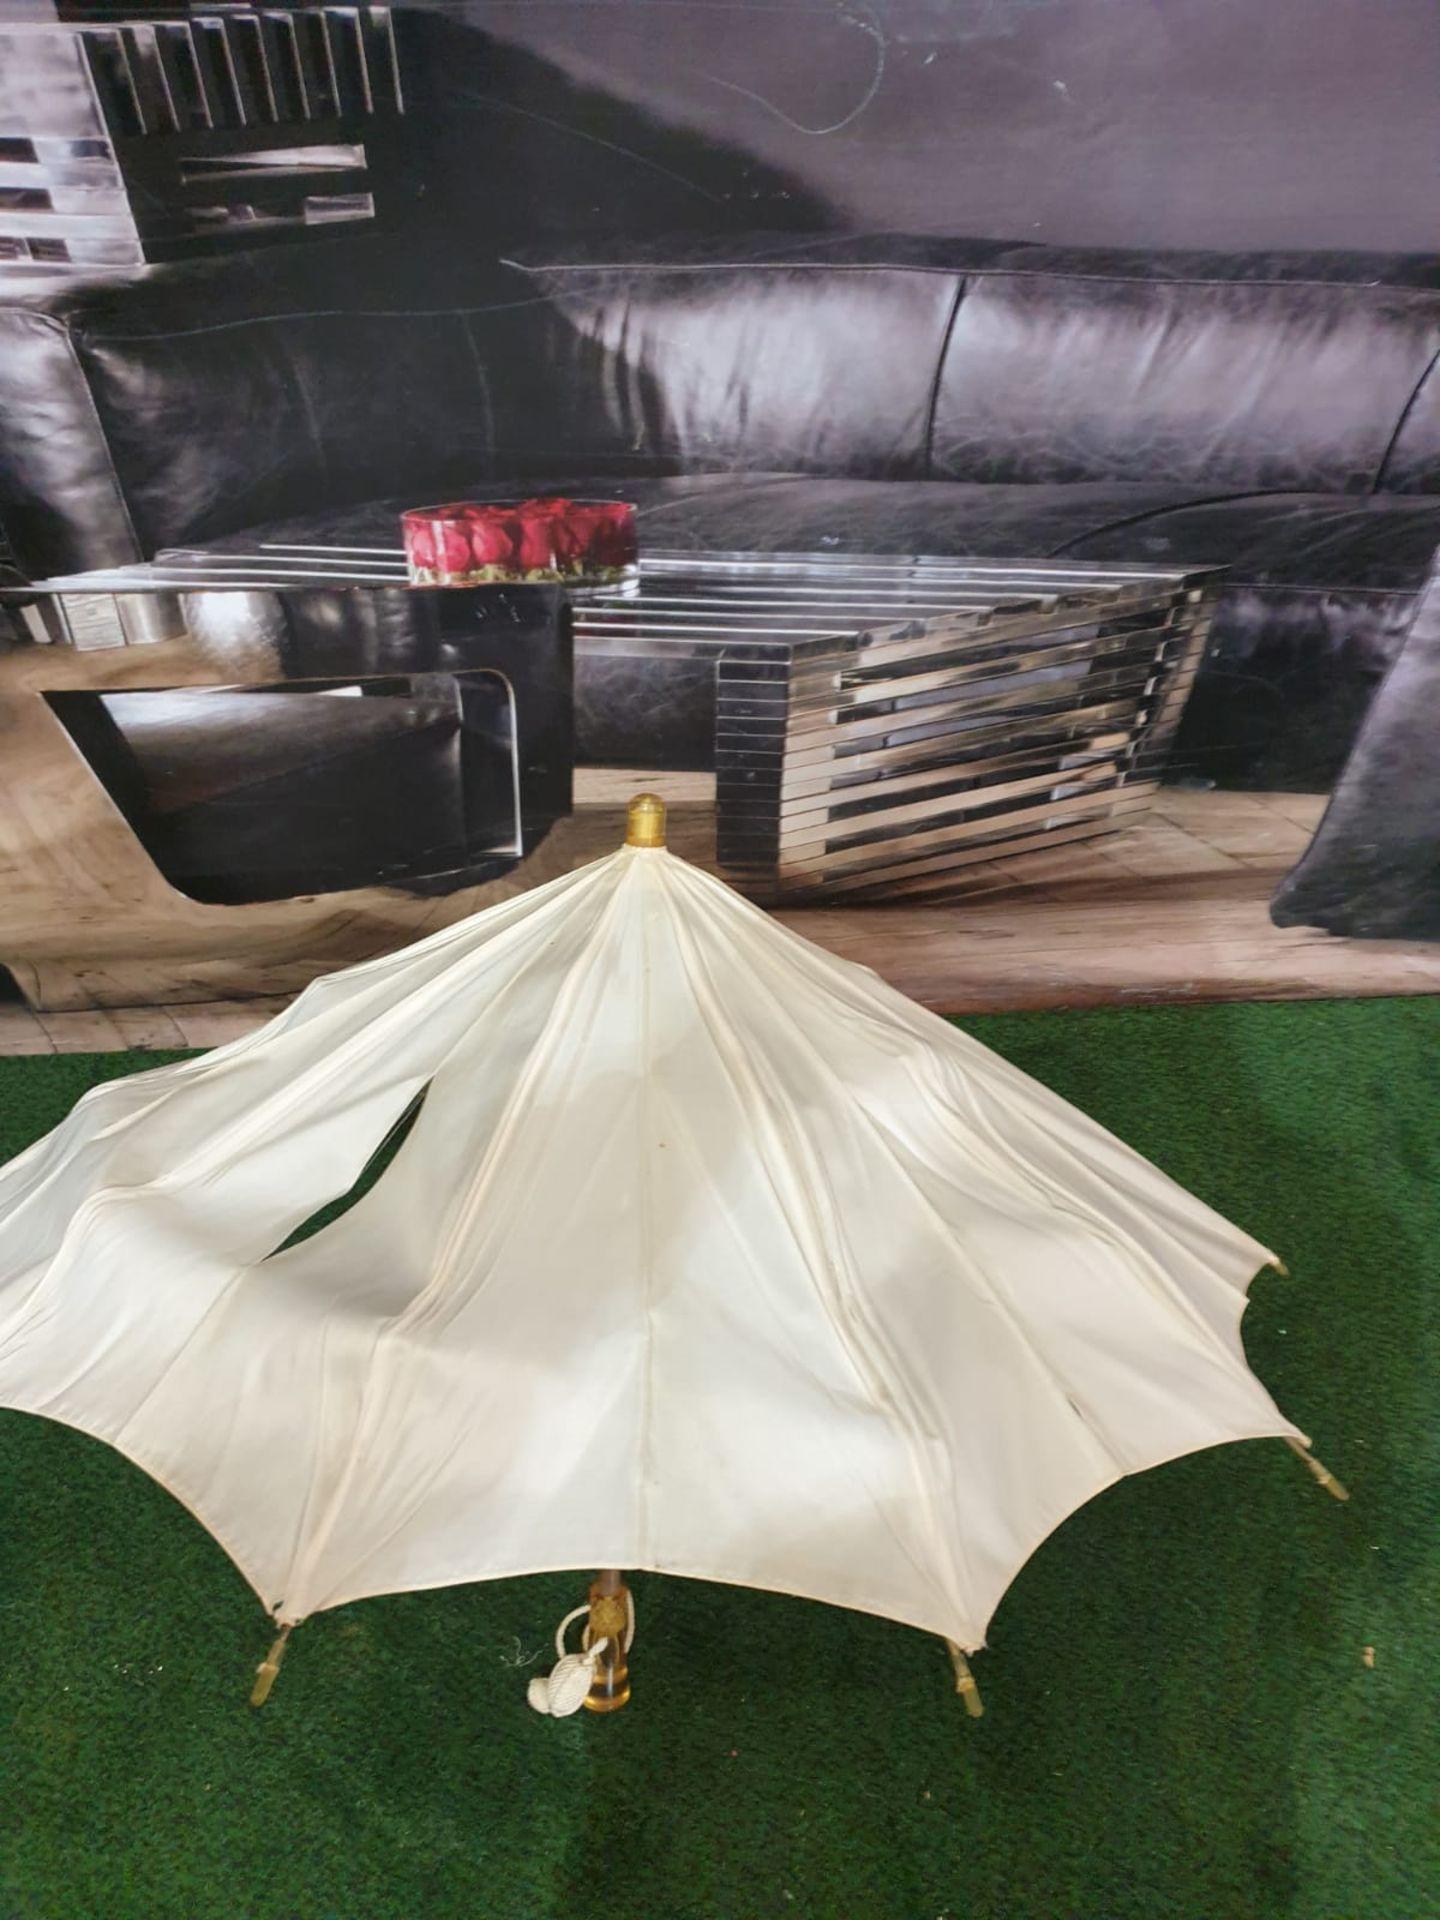 Ladies parasol Cream silk-like material - Yellow handle. Needs T.L.C. - Image 3 of 4